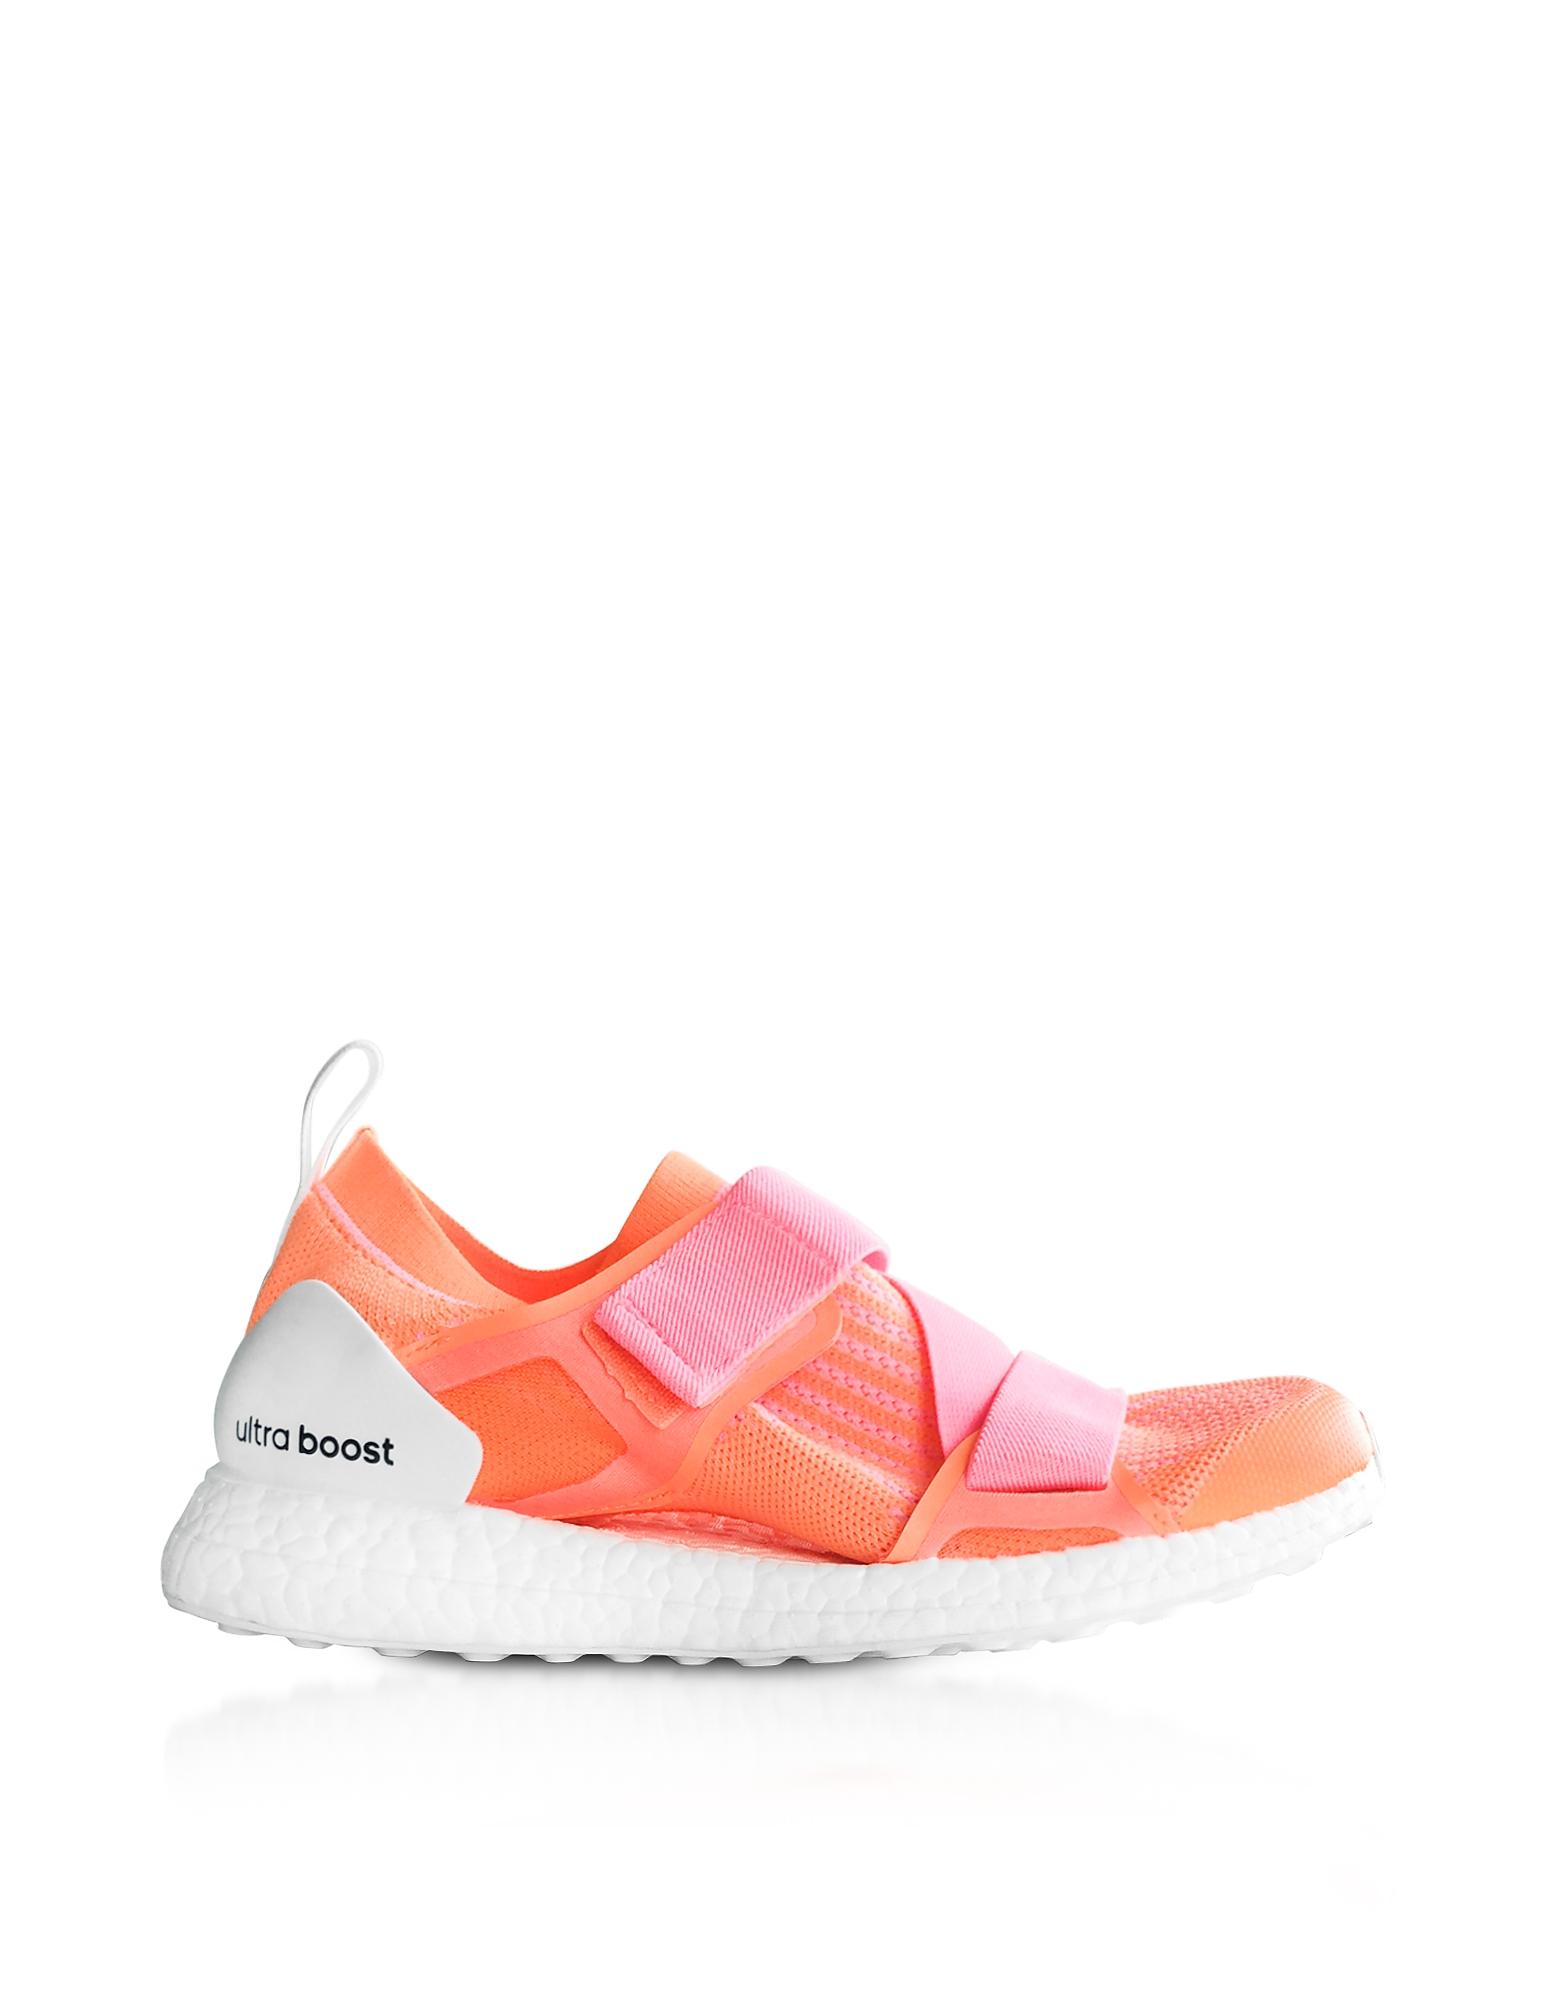 Ultraboost X - Оранжевые и Ярко-Розовые Кроссовки